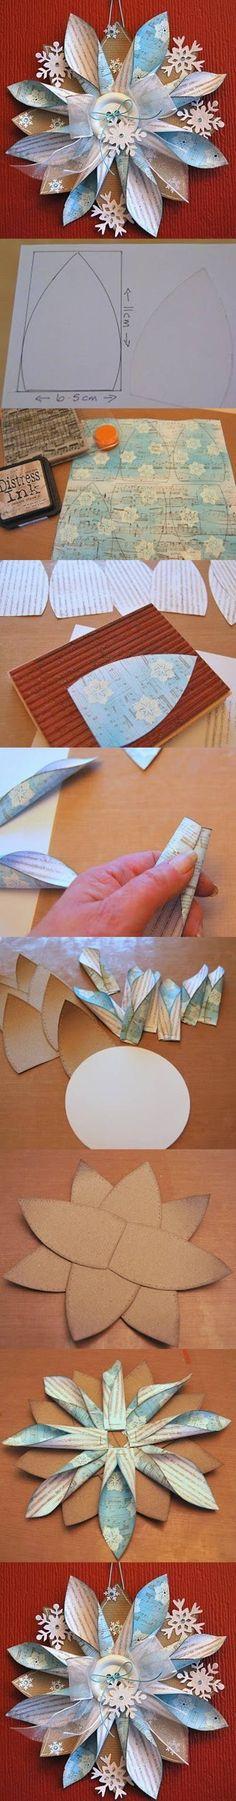 DIY Paper Ornaments tutorial origami christmas crafts